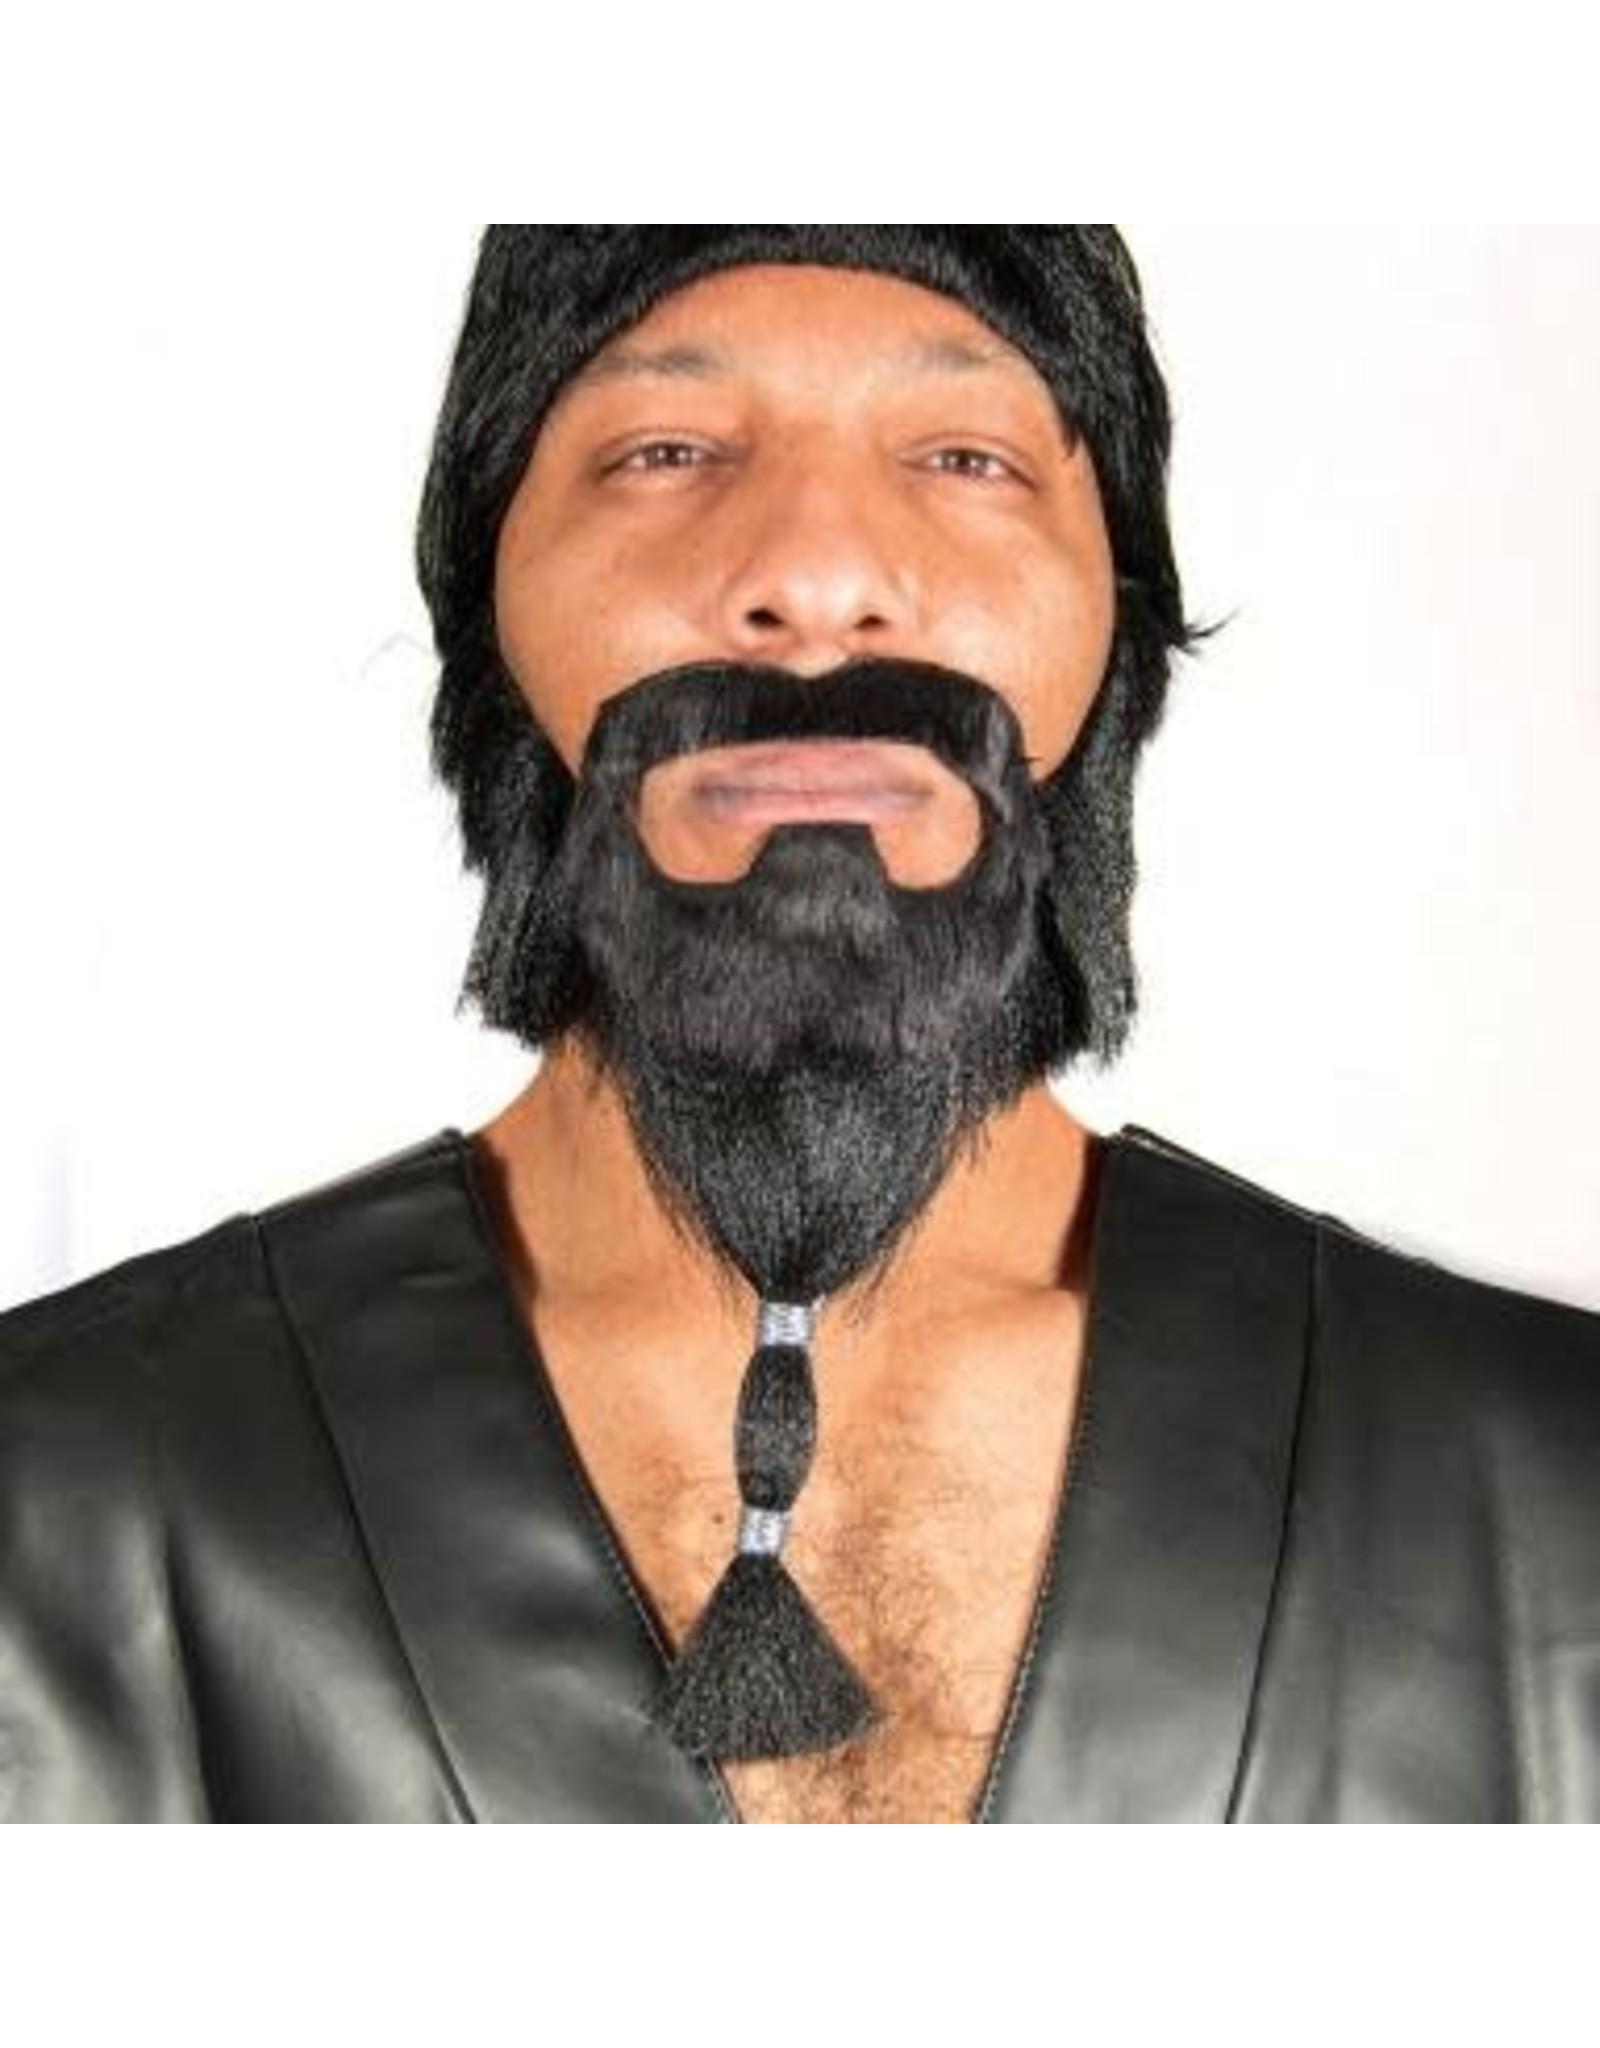 HM Smallwares Throne Beard